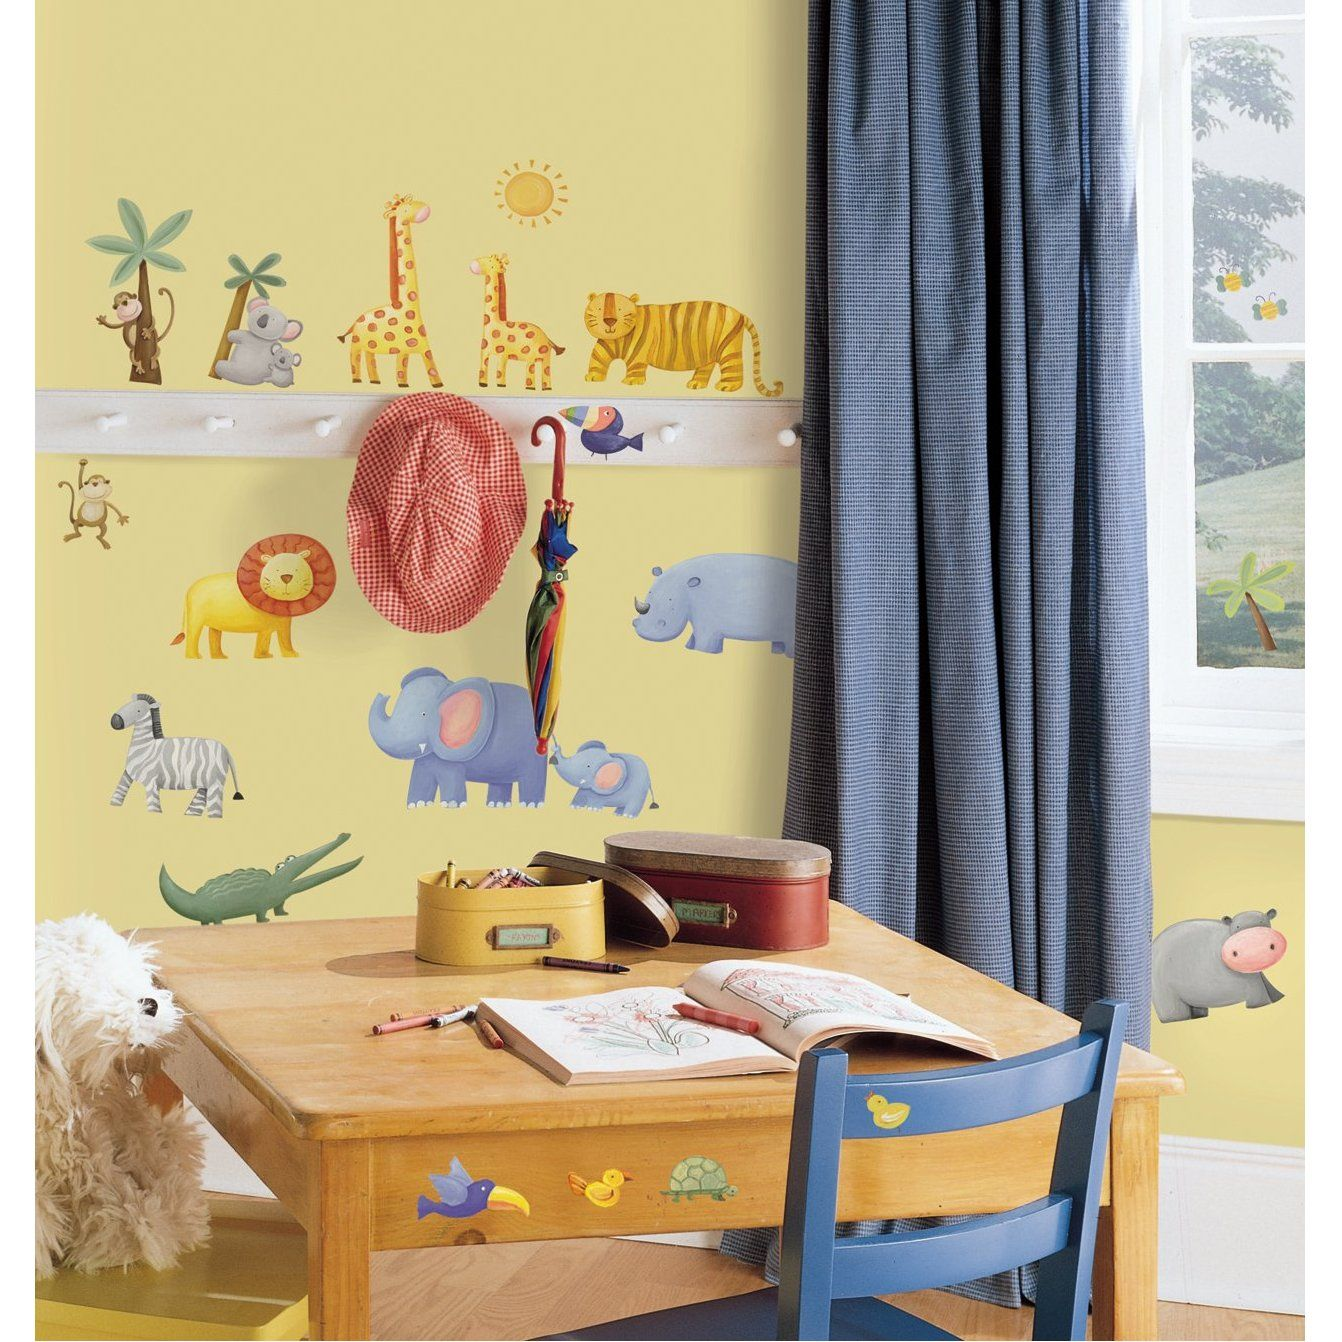 Jungle Adventure Peel & Stick Wall Coverings | Kids\' Space Ideas ...